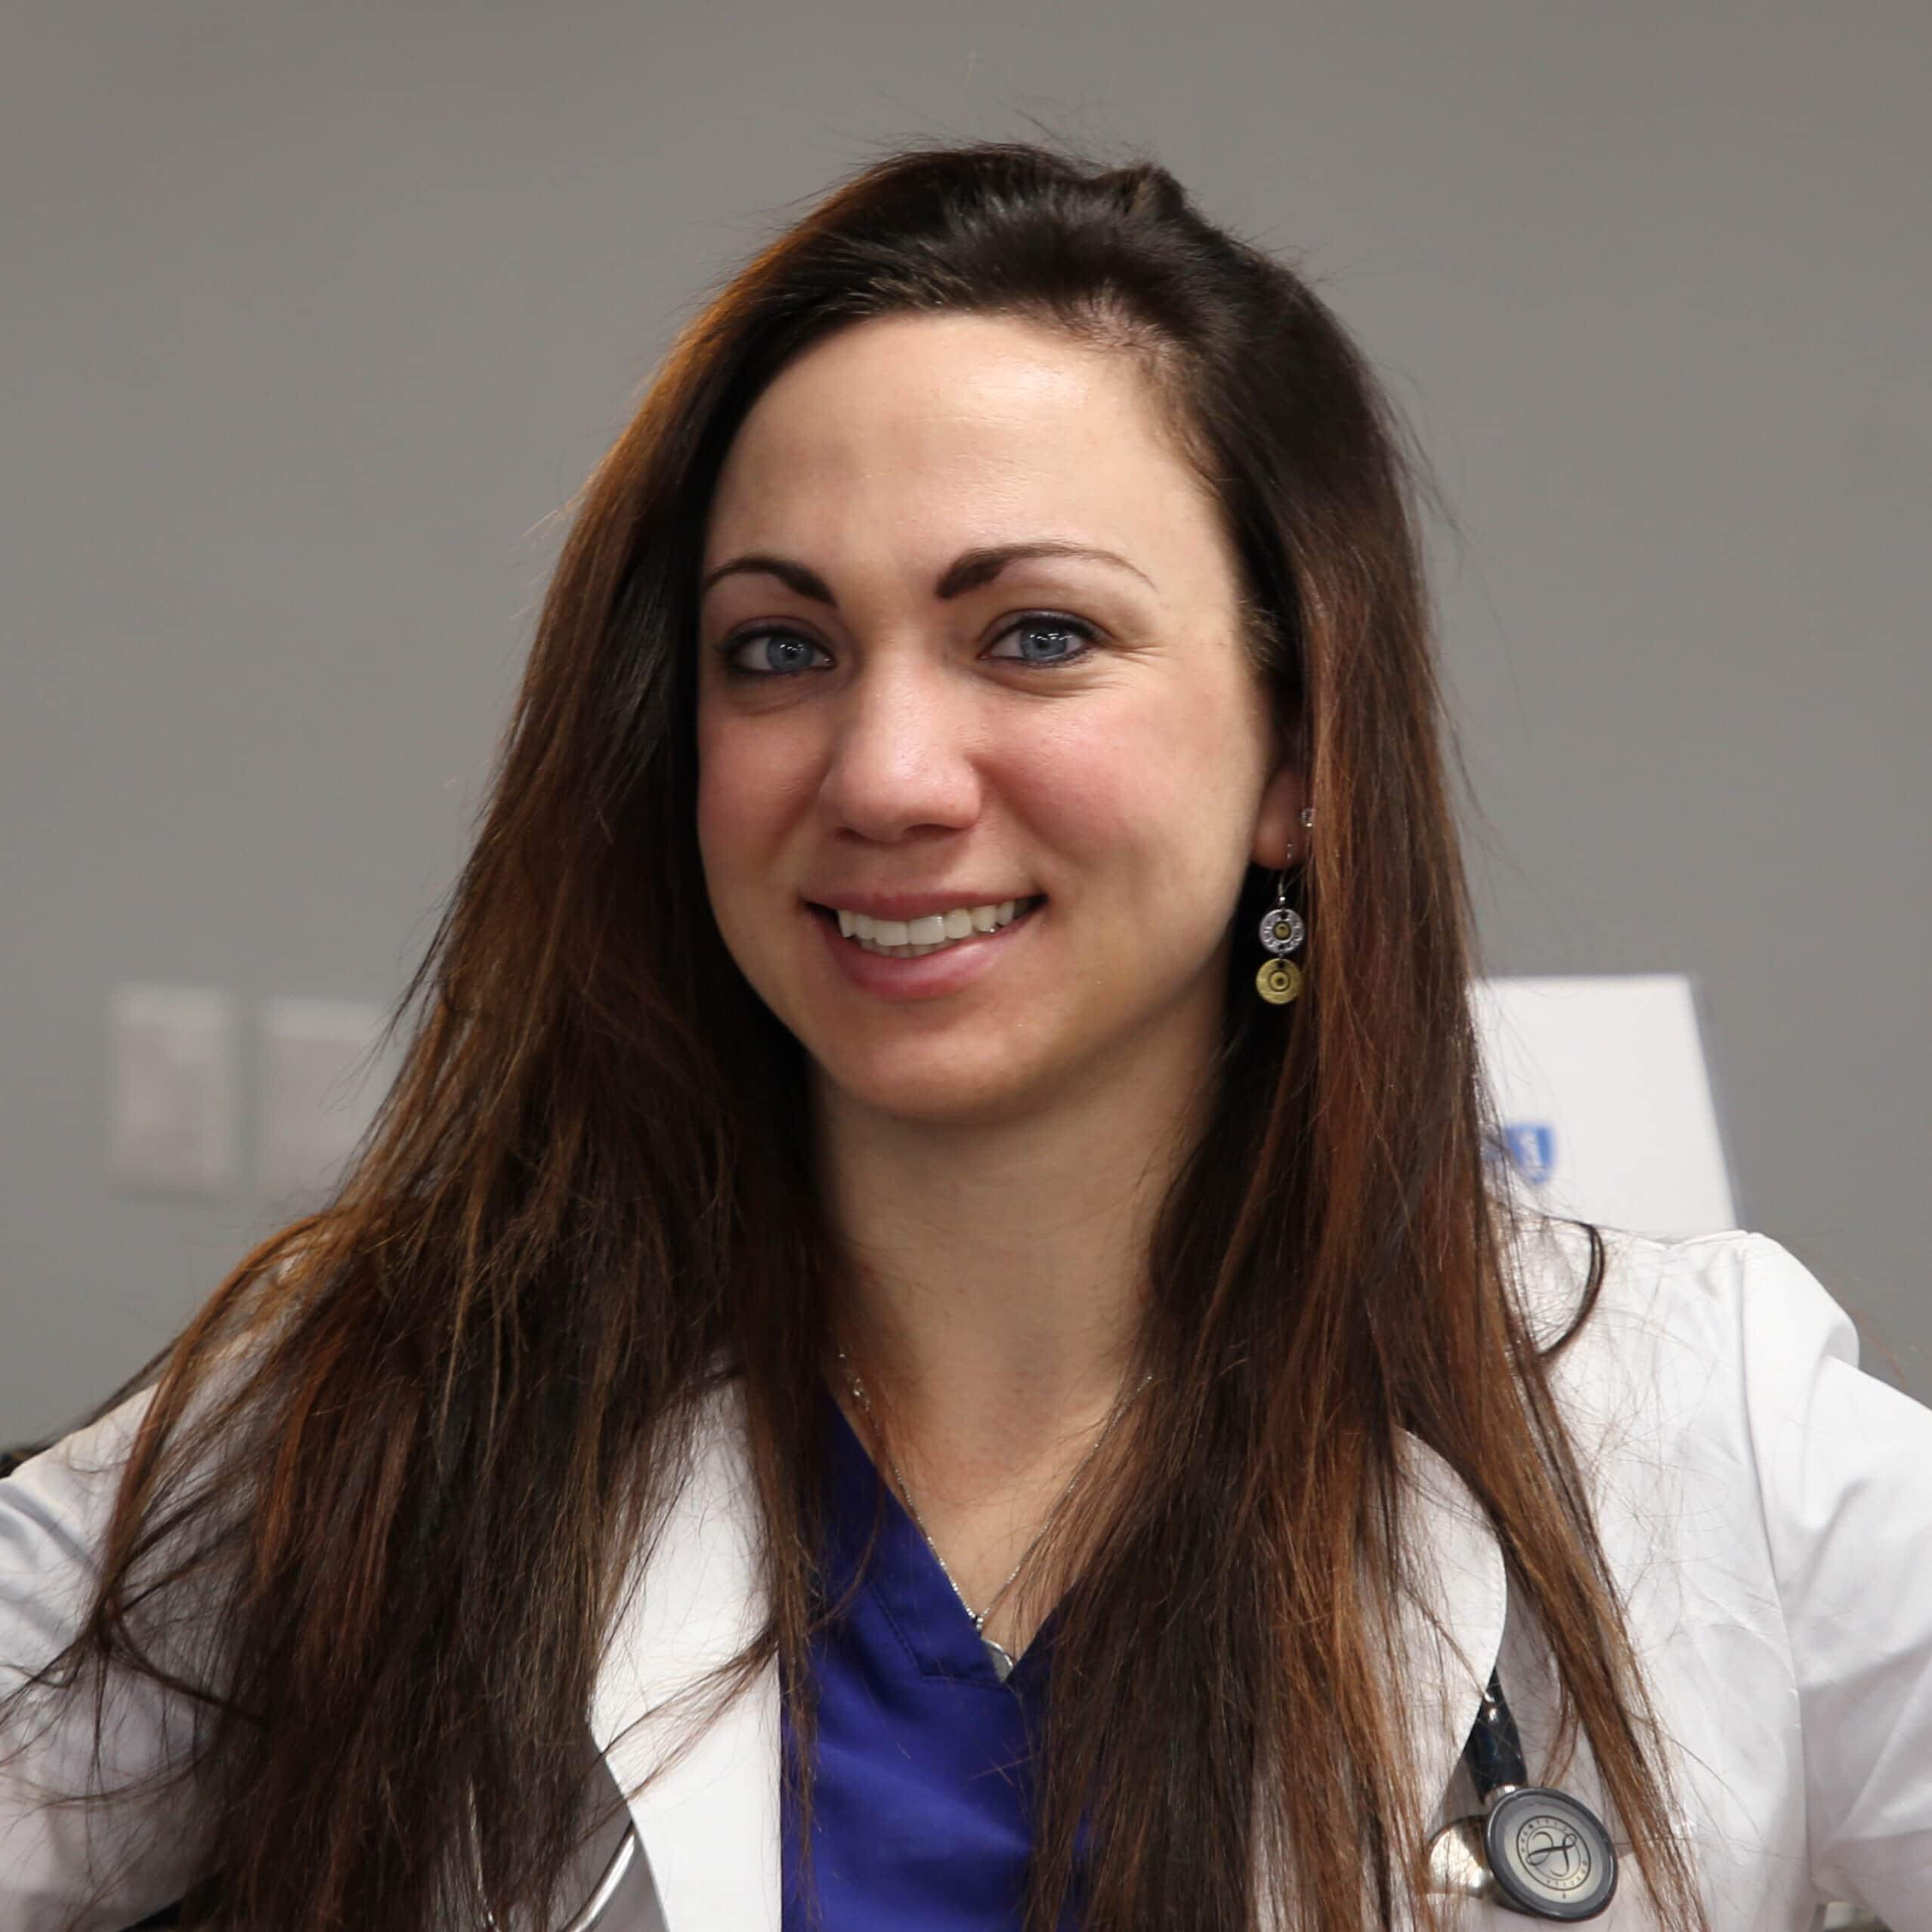 Dr. Paige Wallace